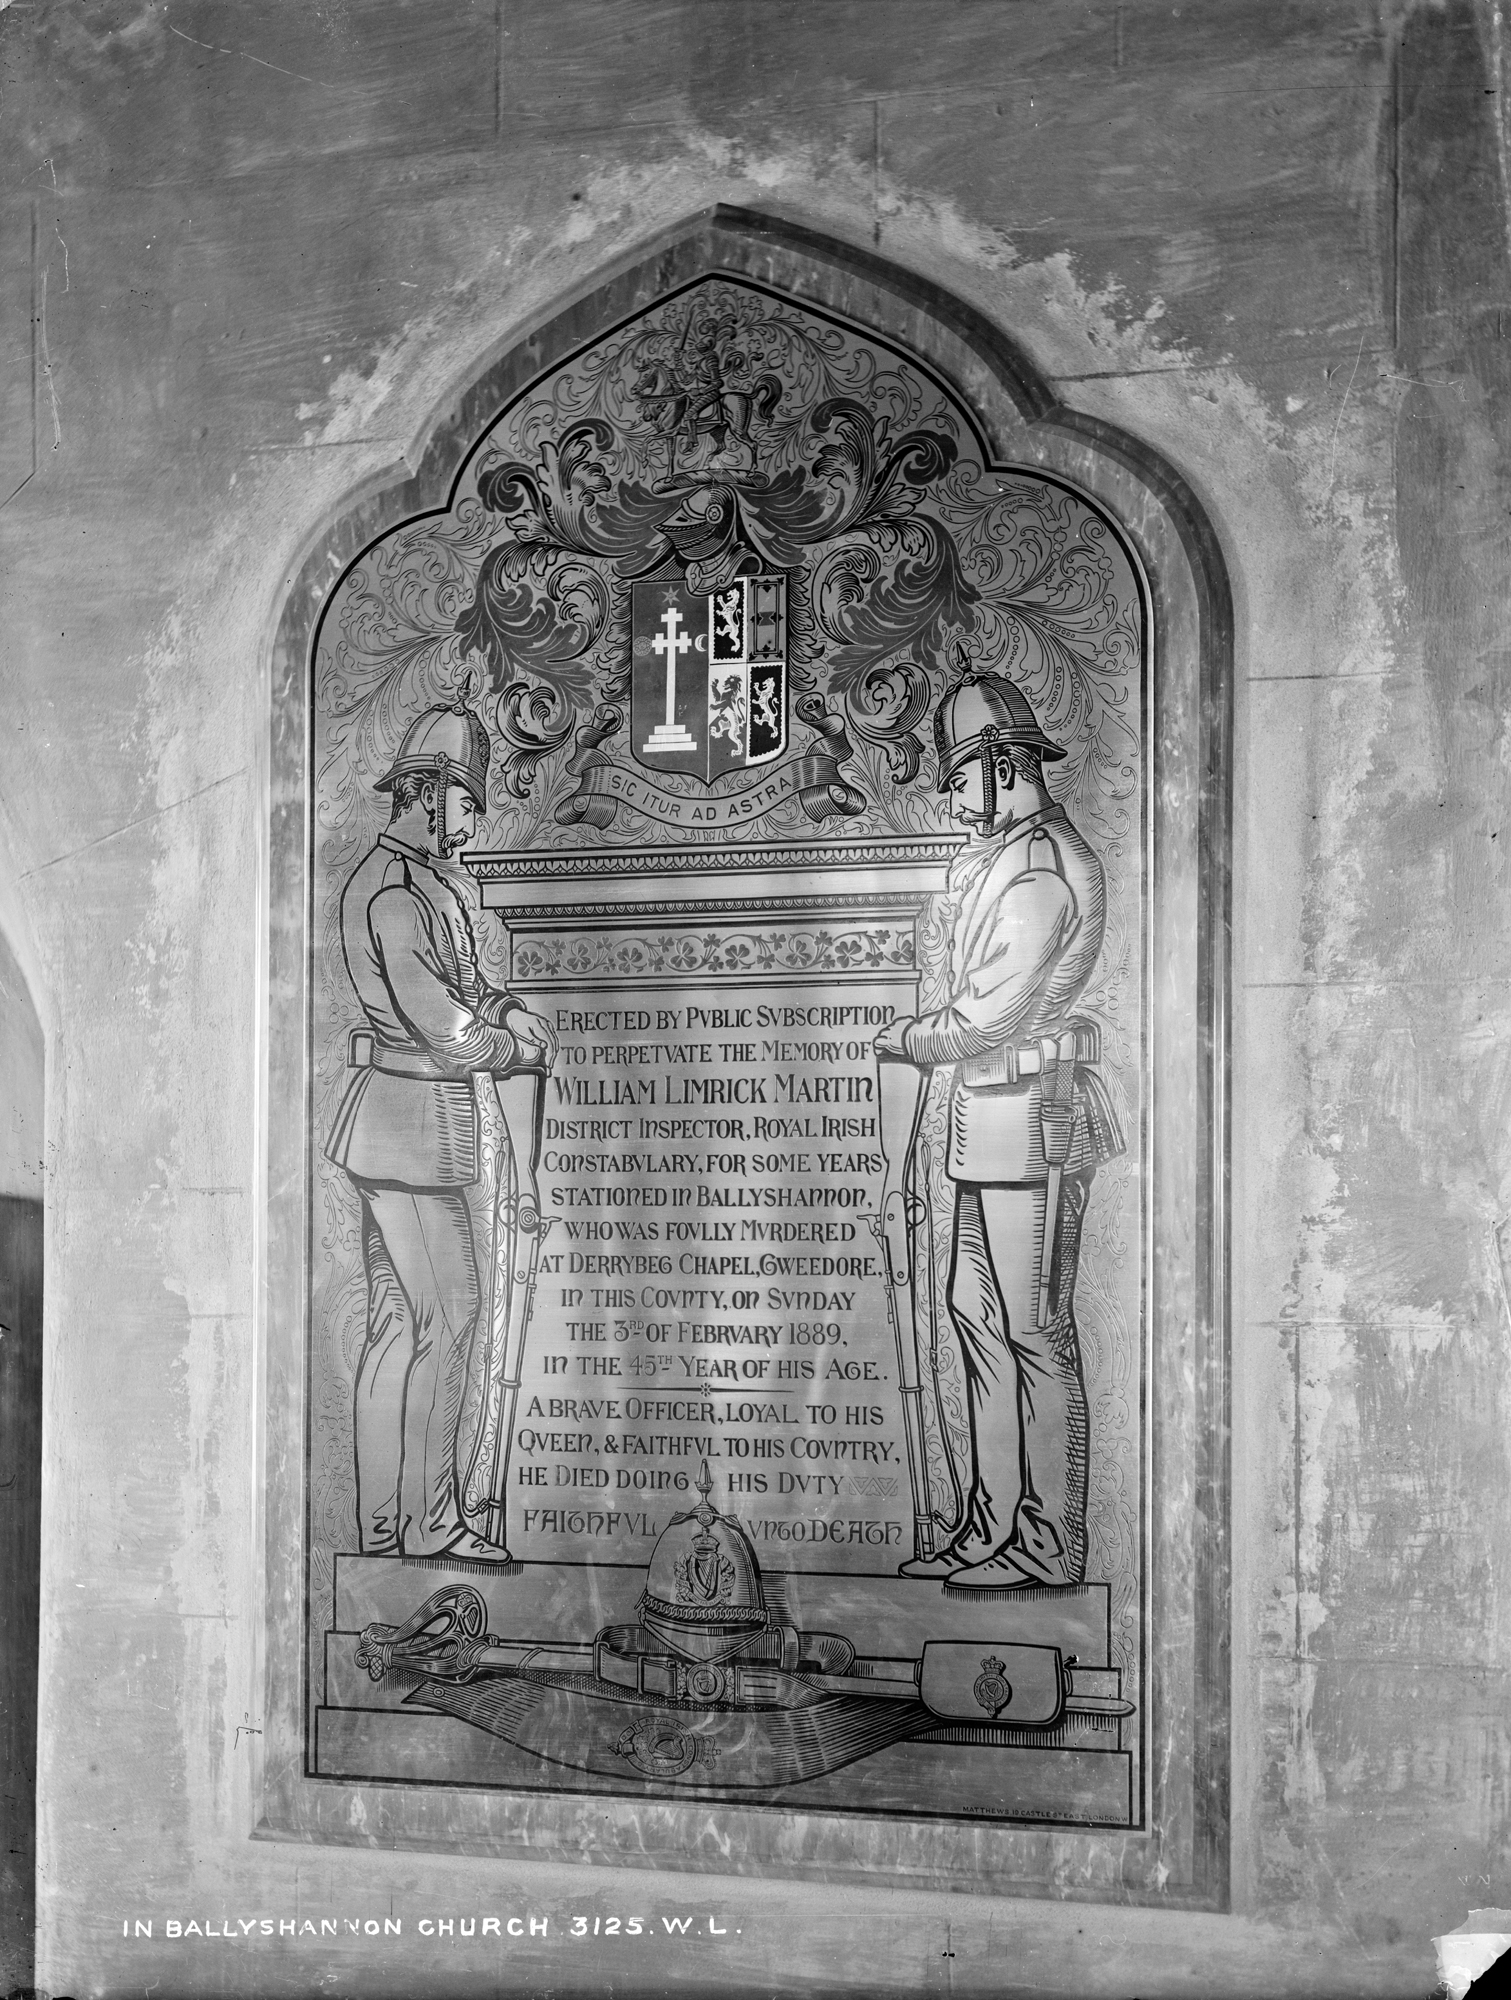 Church, Interior Memorial, Ballyshannon, Co. Donegal